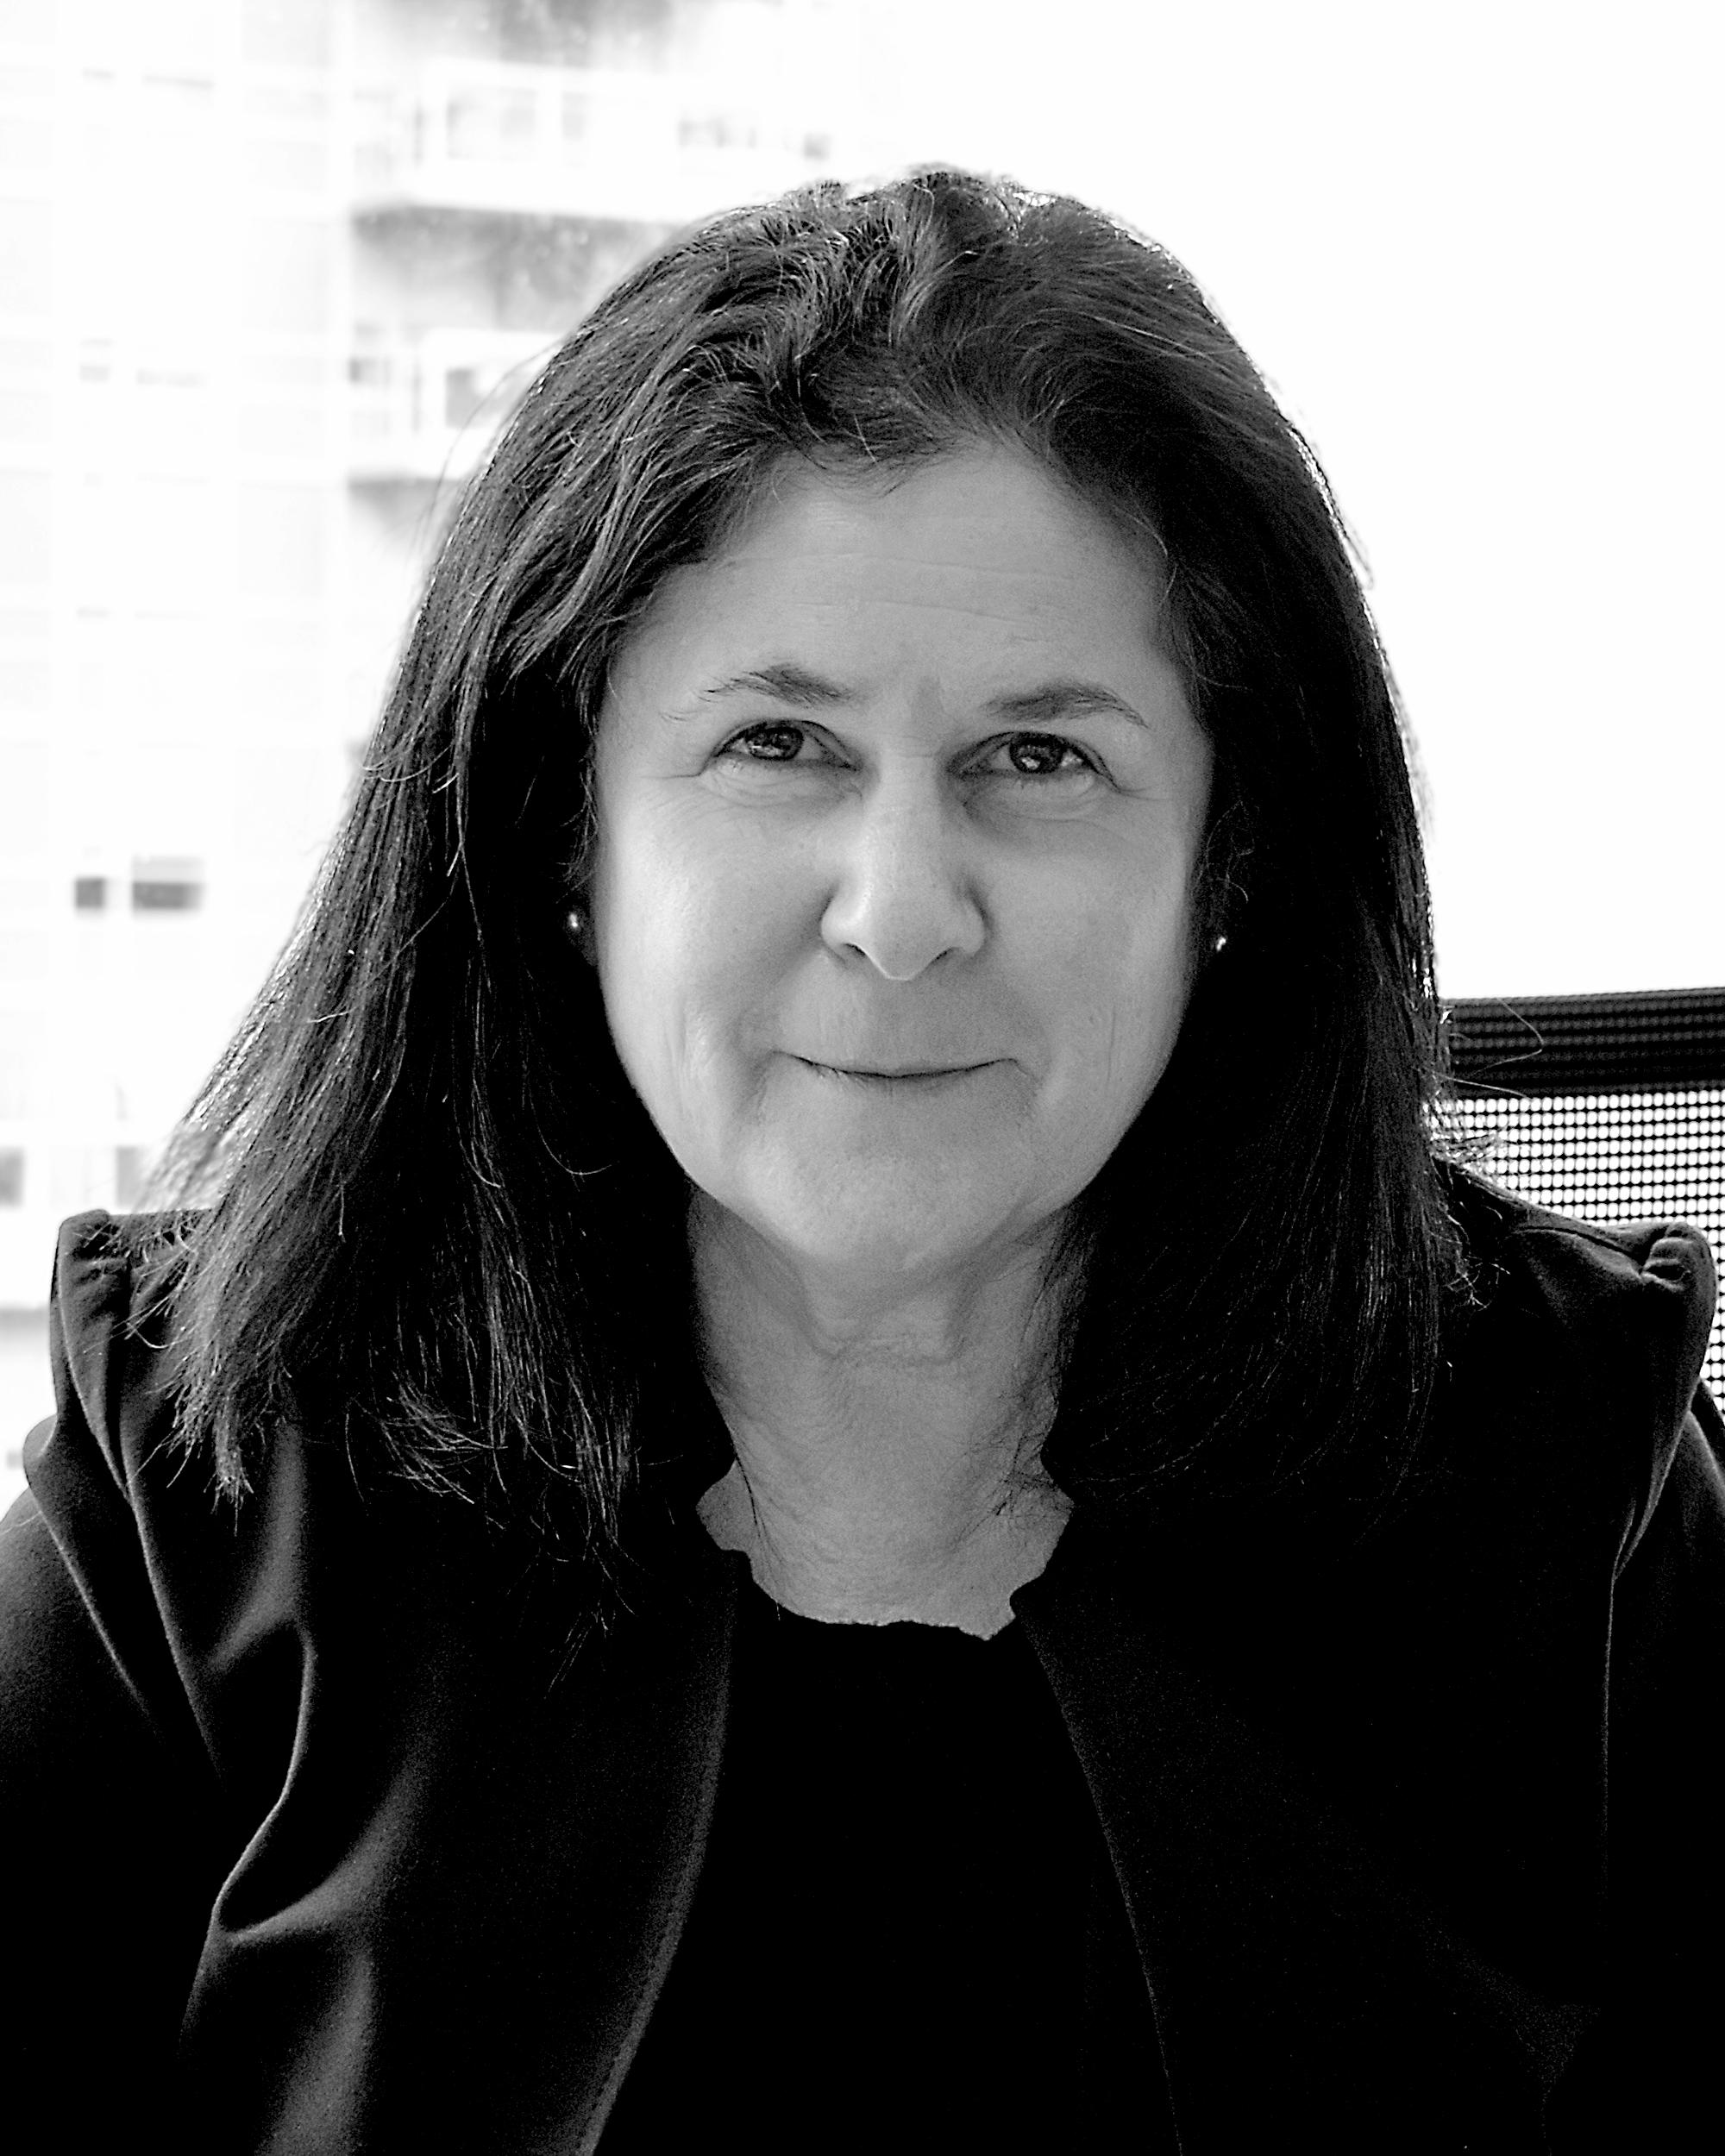 Headshot of Anita Leonoff